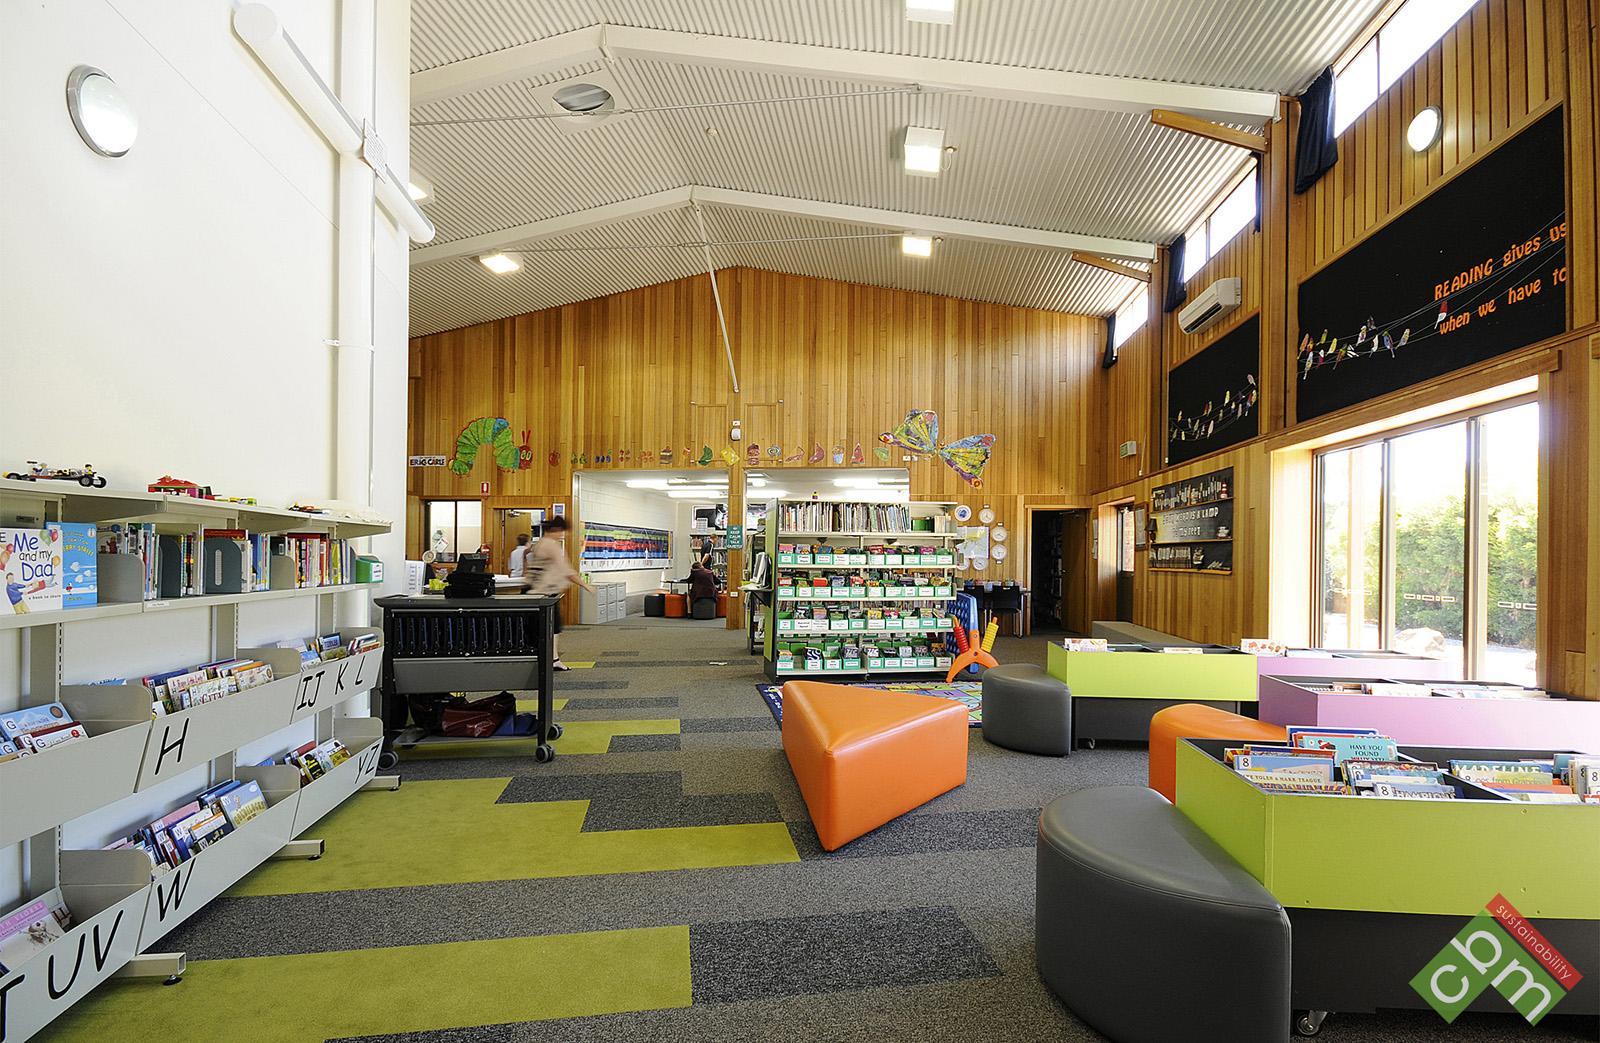 CHCS library (2).JPG